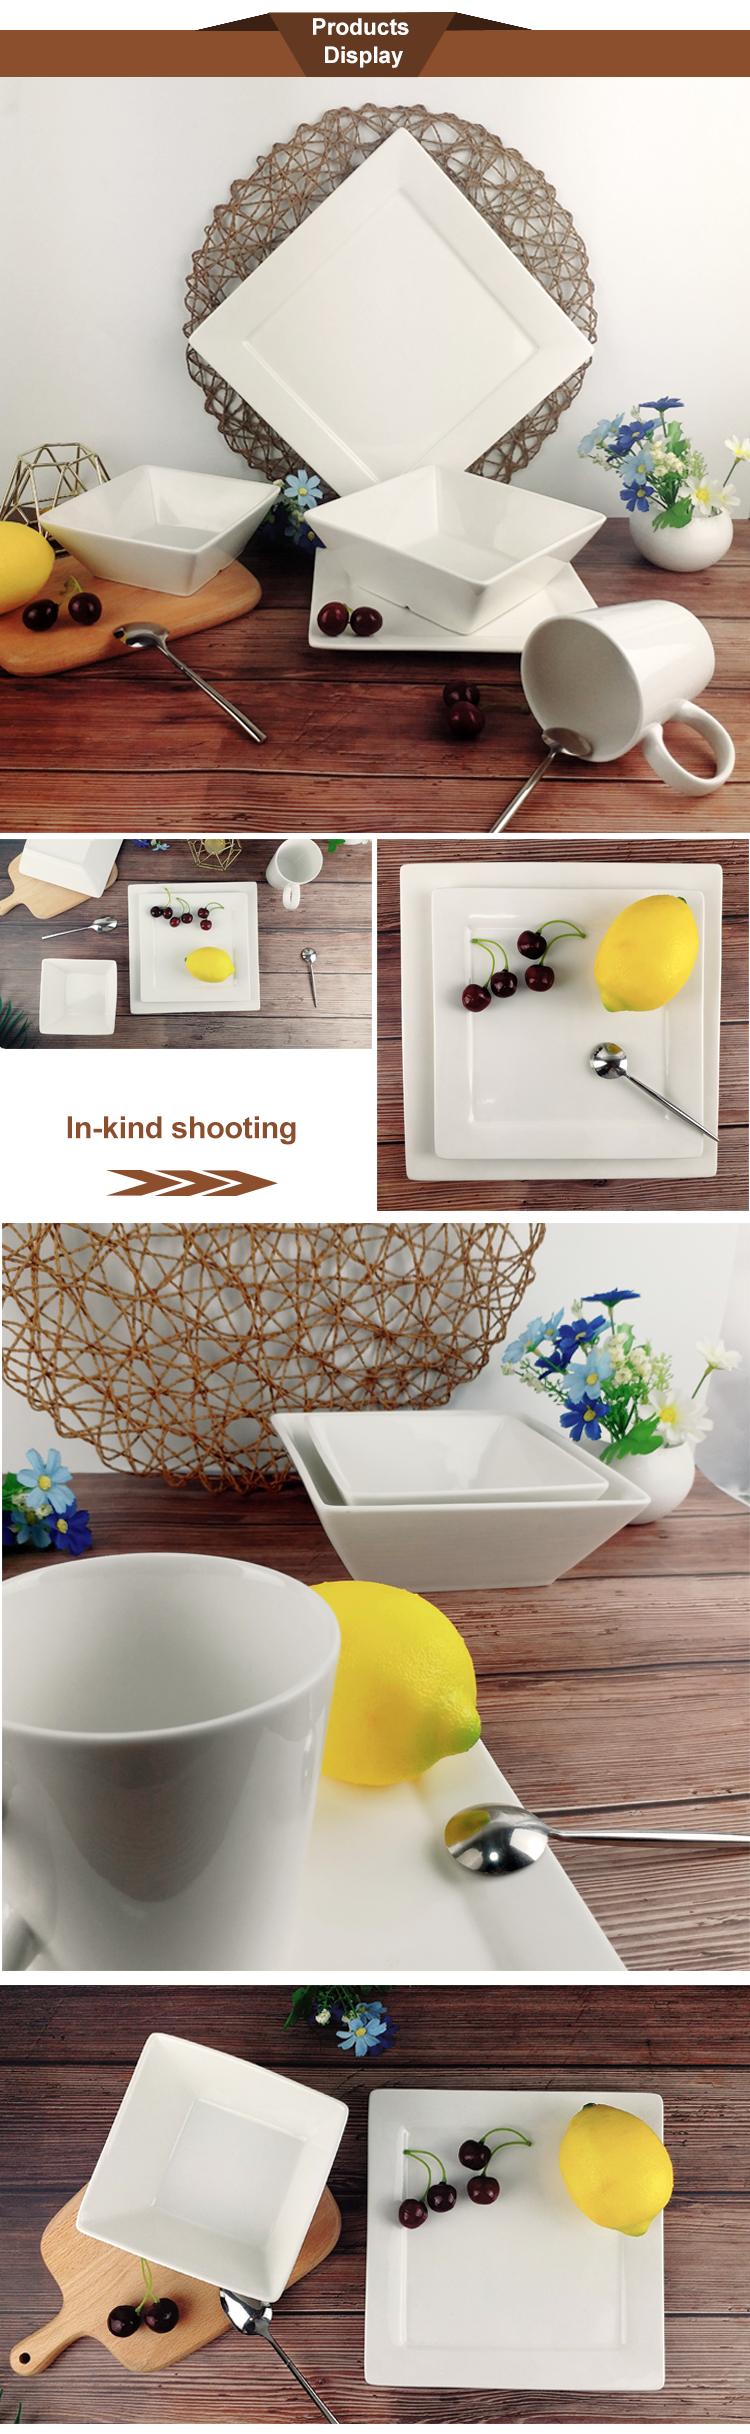 Neue design langlebig hotel hochzeit keramik flache ladegerät platte set